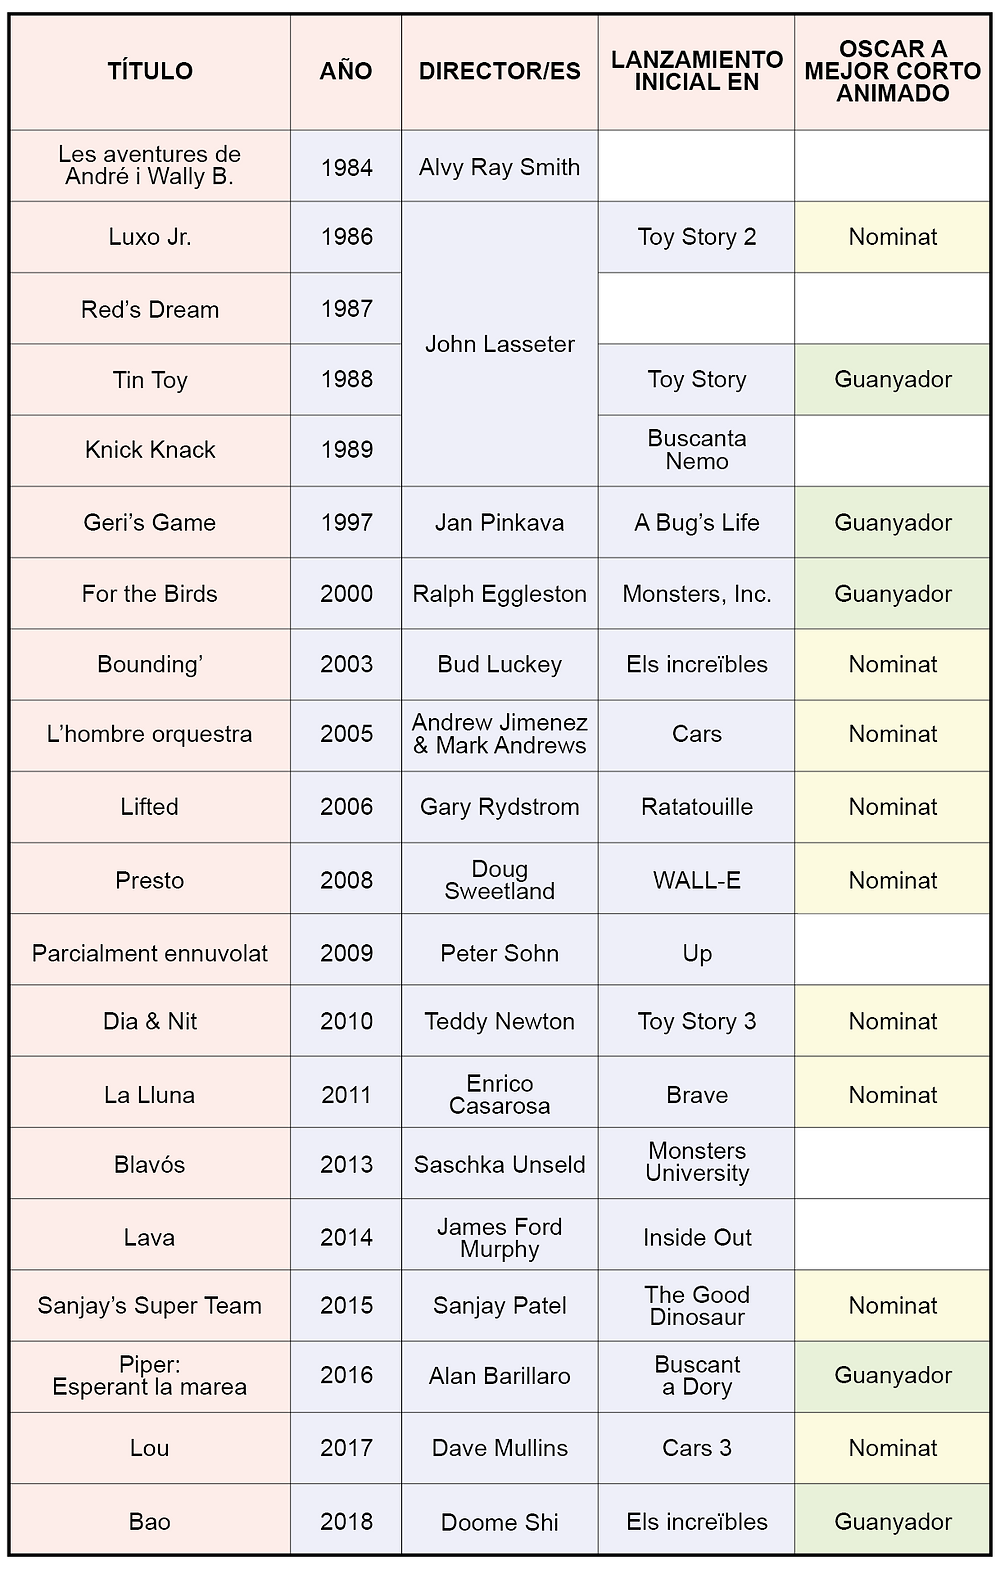 Tabla Cortometrajes Pixar